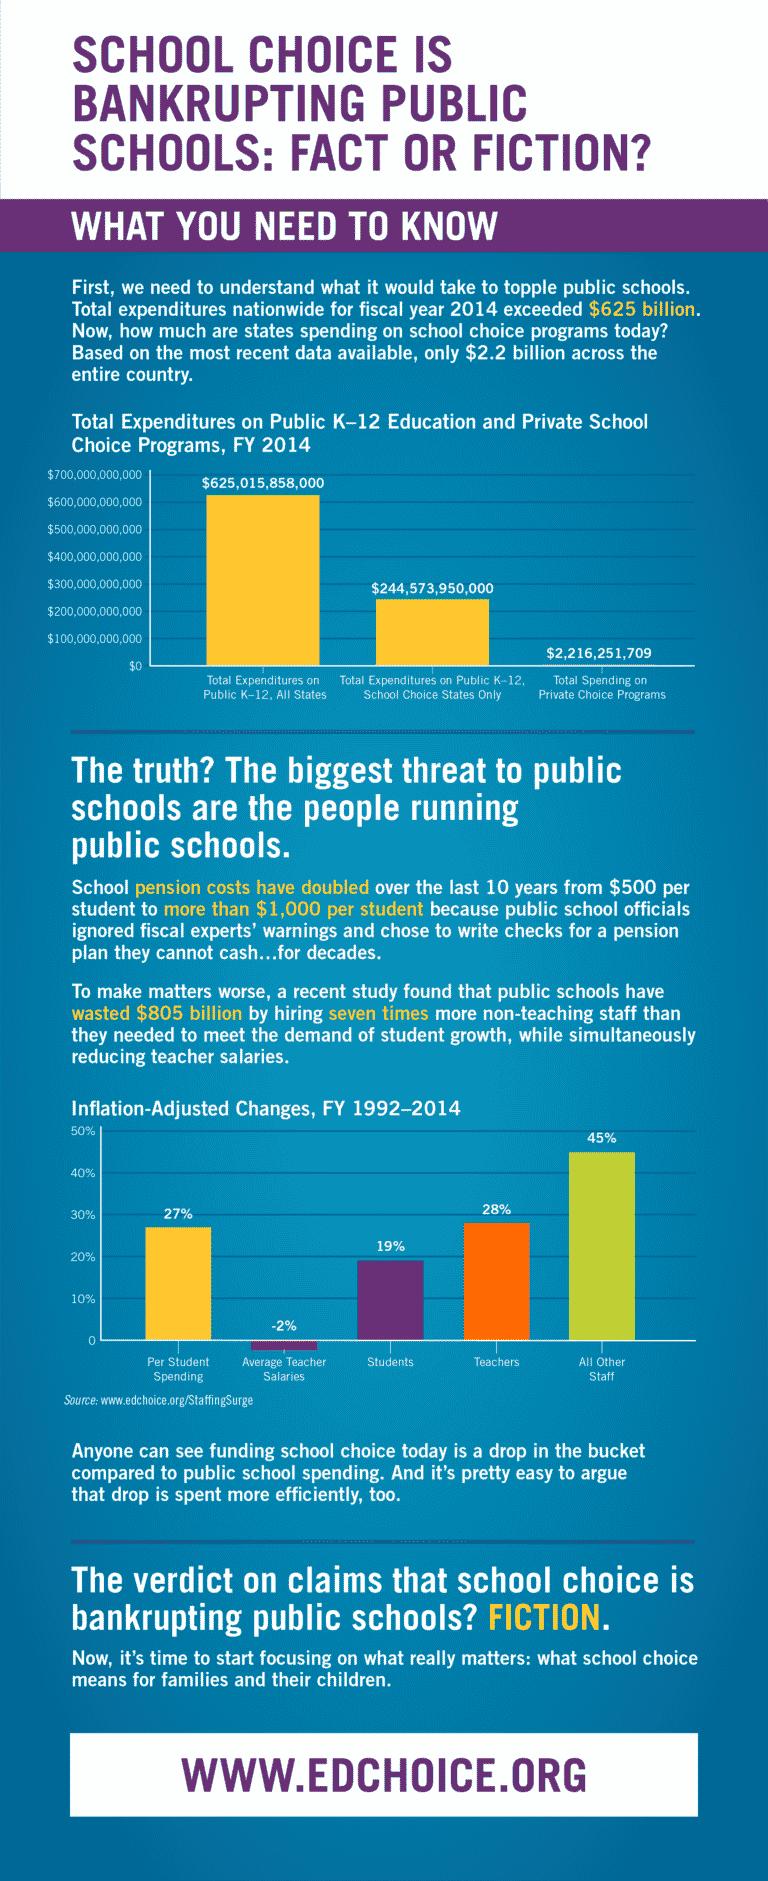 School Choice is Bankrupting Schools